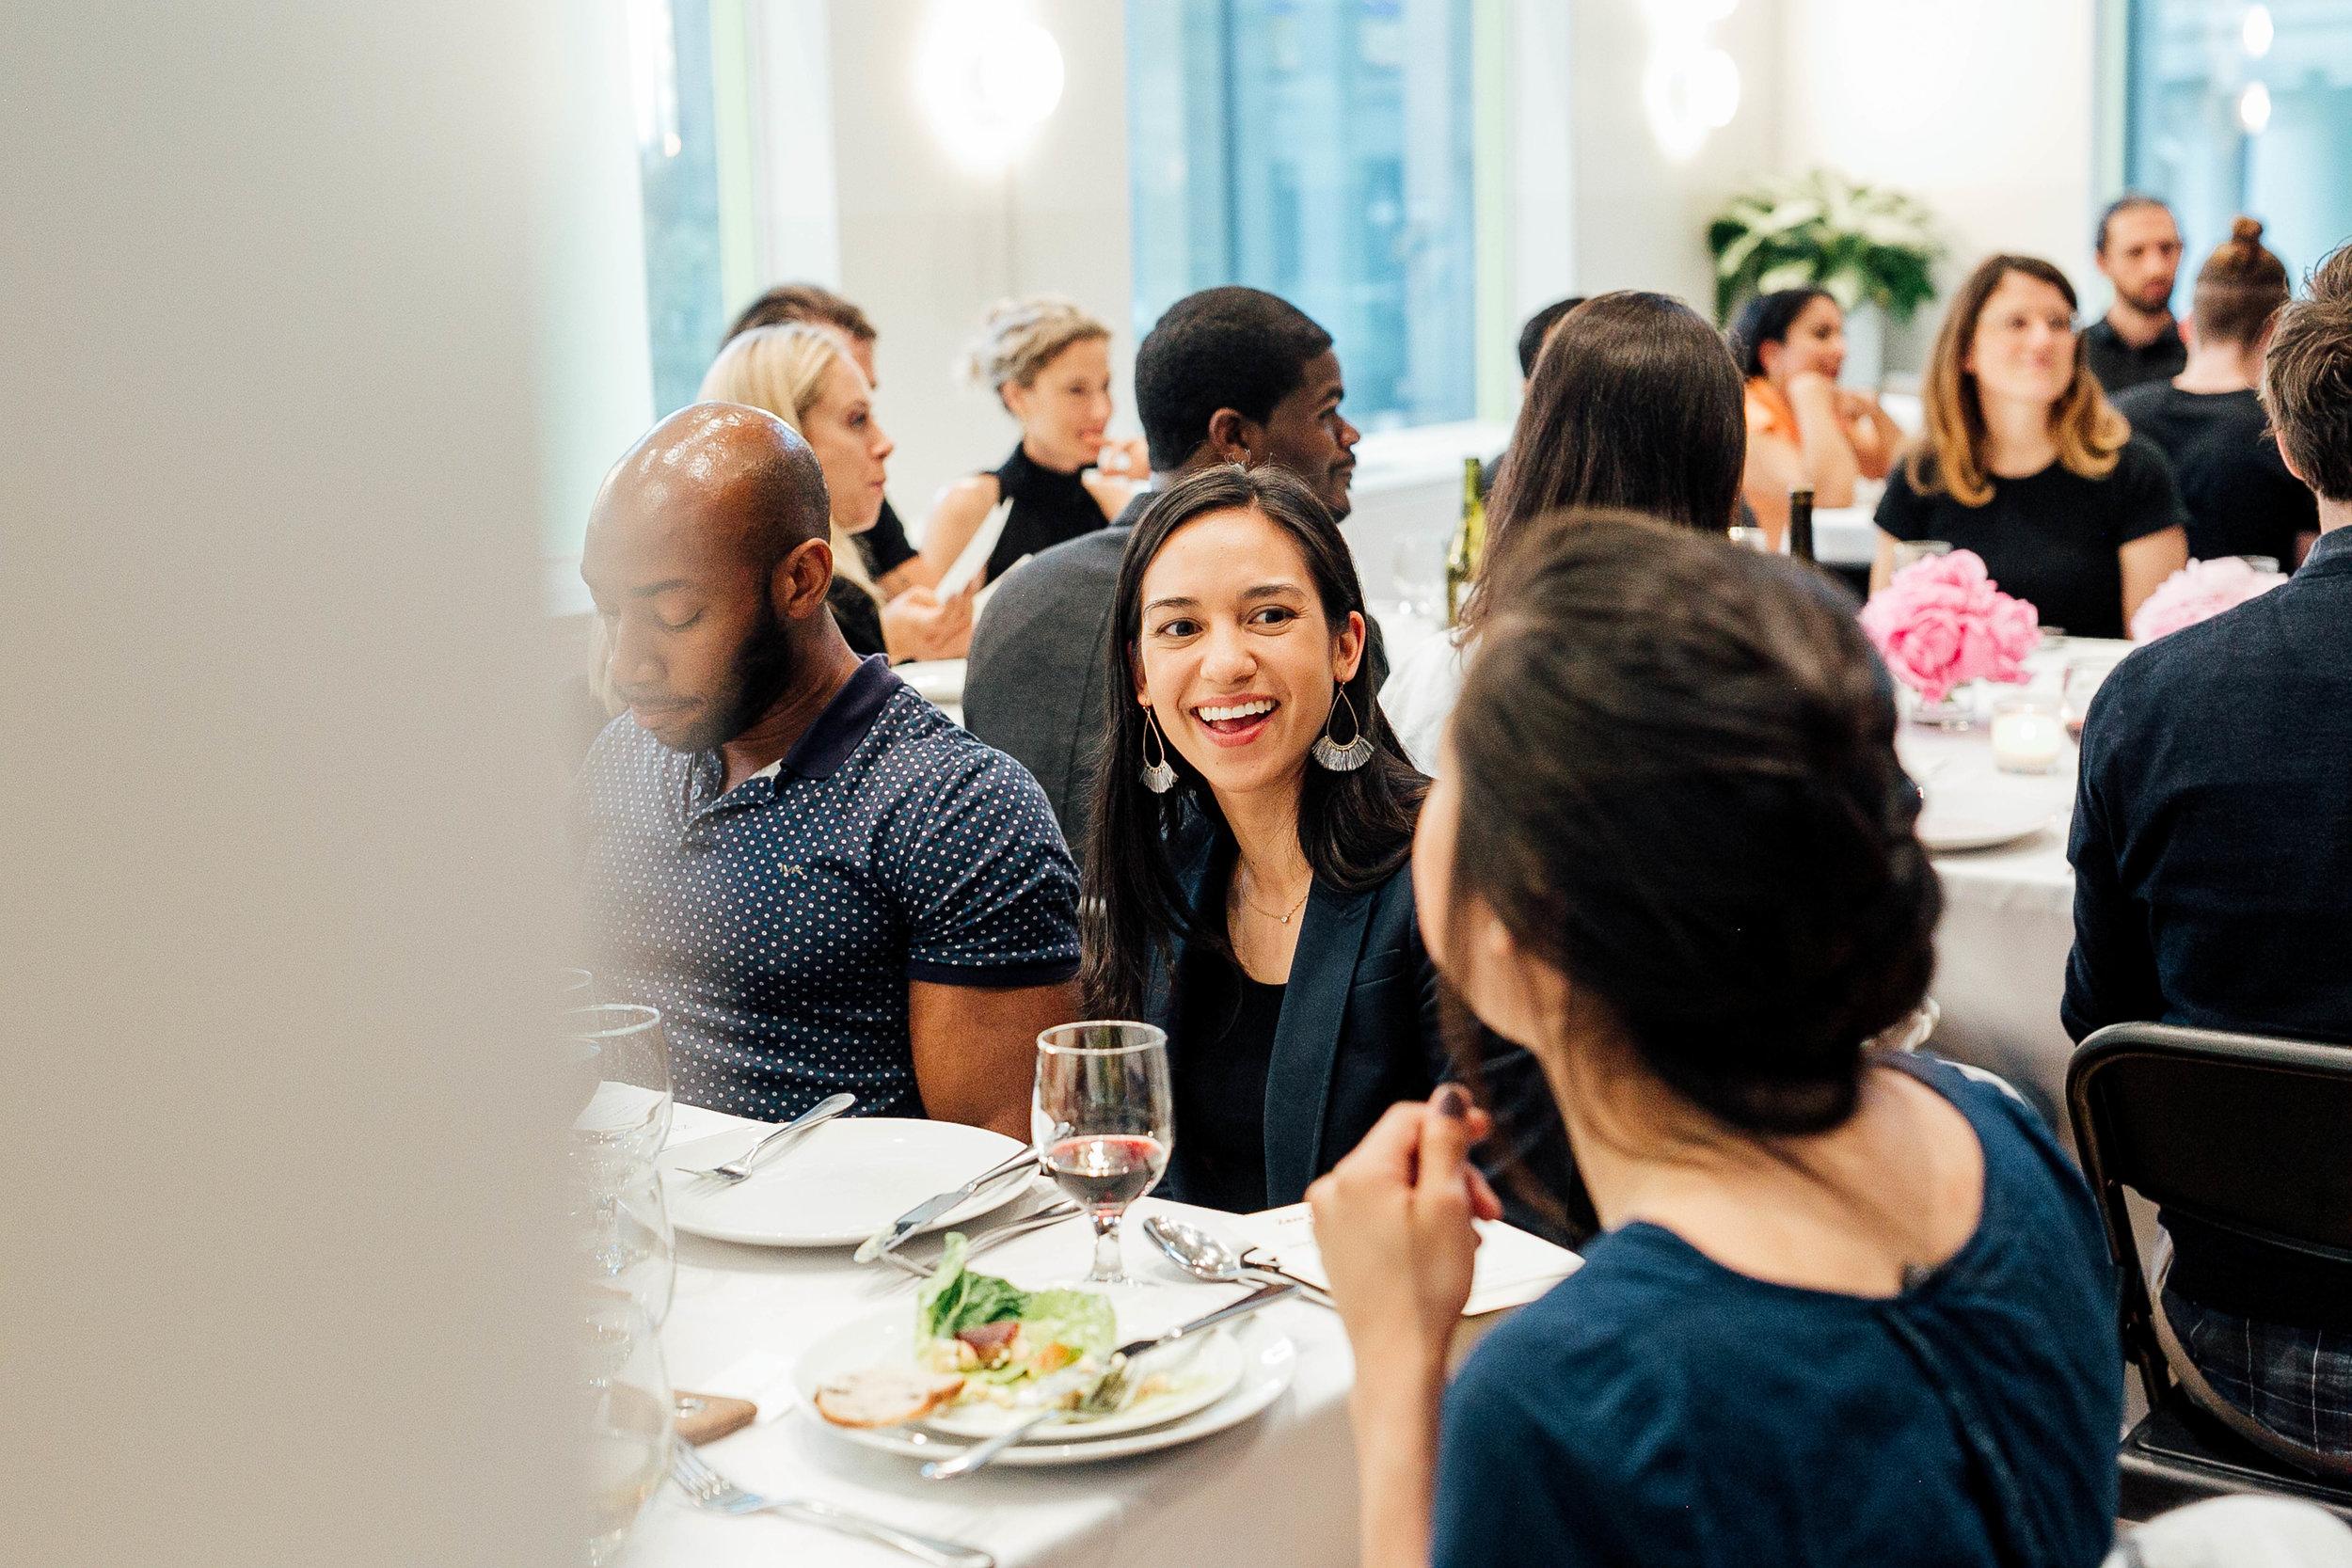 50/50 Dinners - Zero Gap Community Dinners